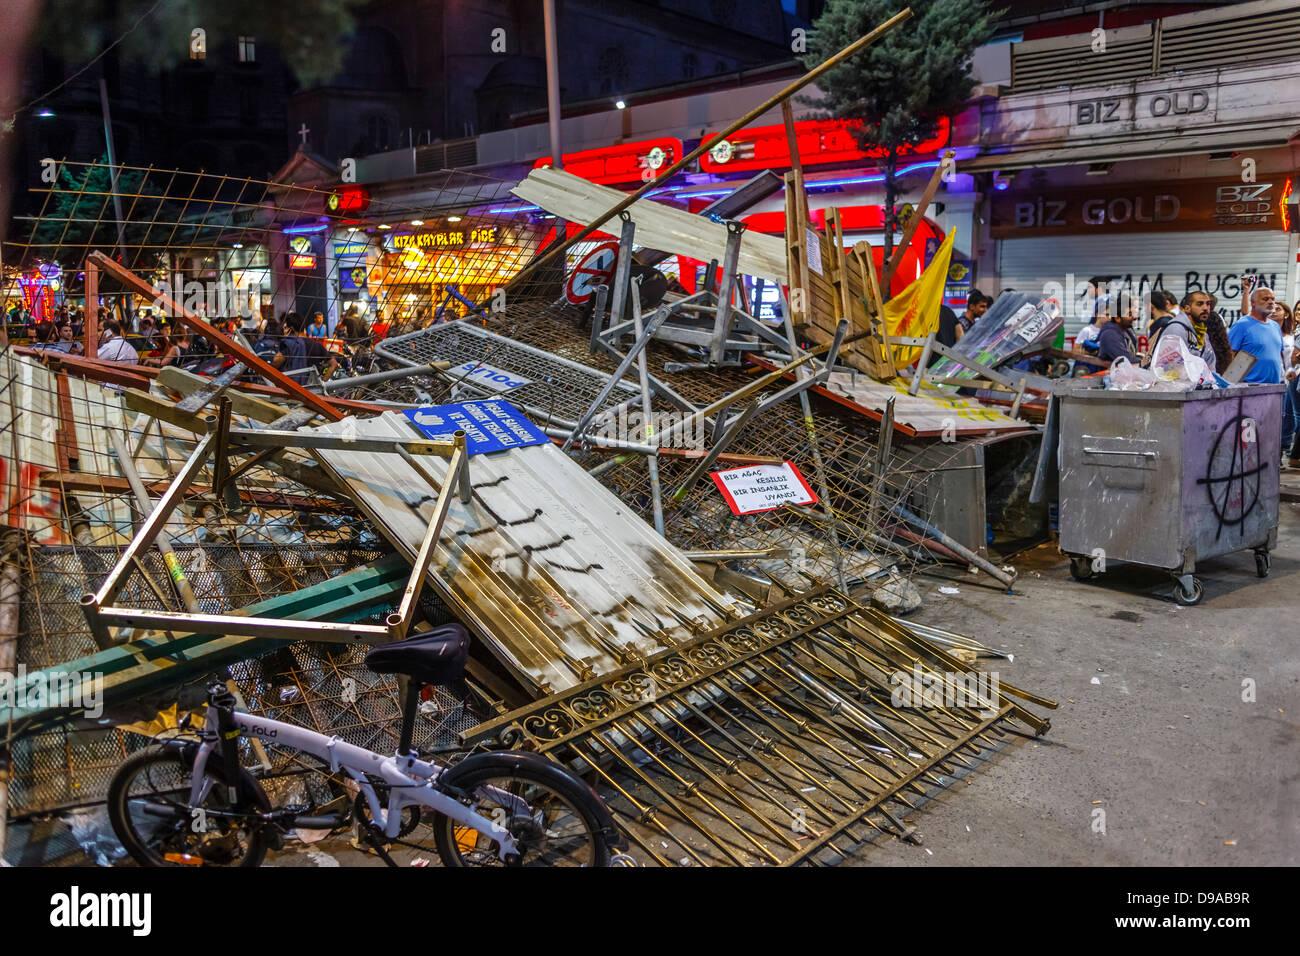 Barricade during Taksim Gezi Park protests, Istanbul, Turkey - Stock Image